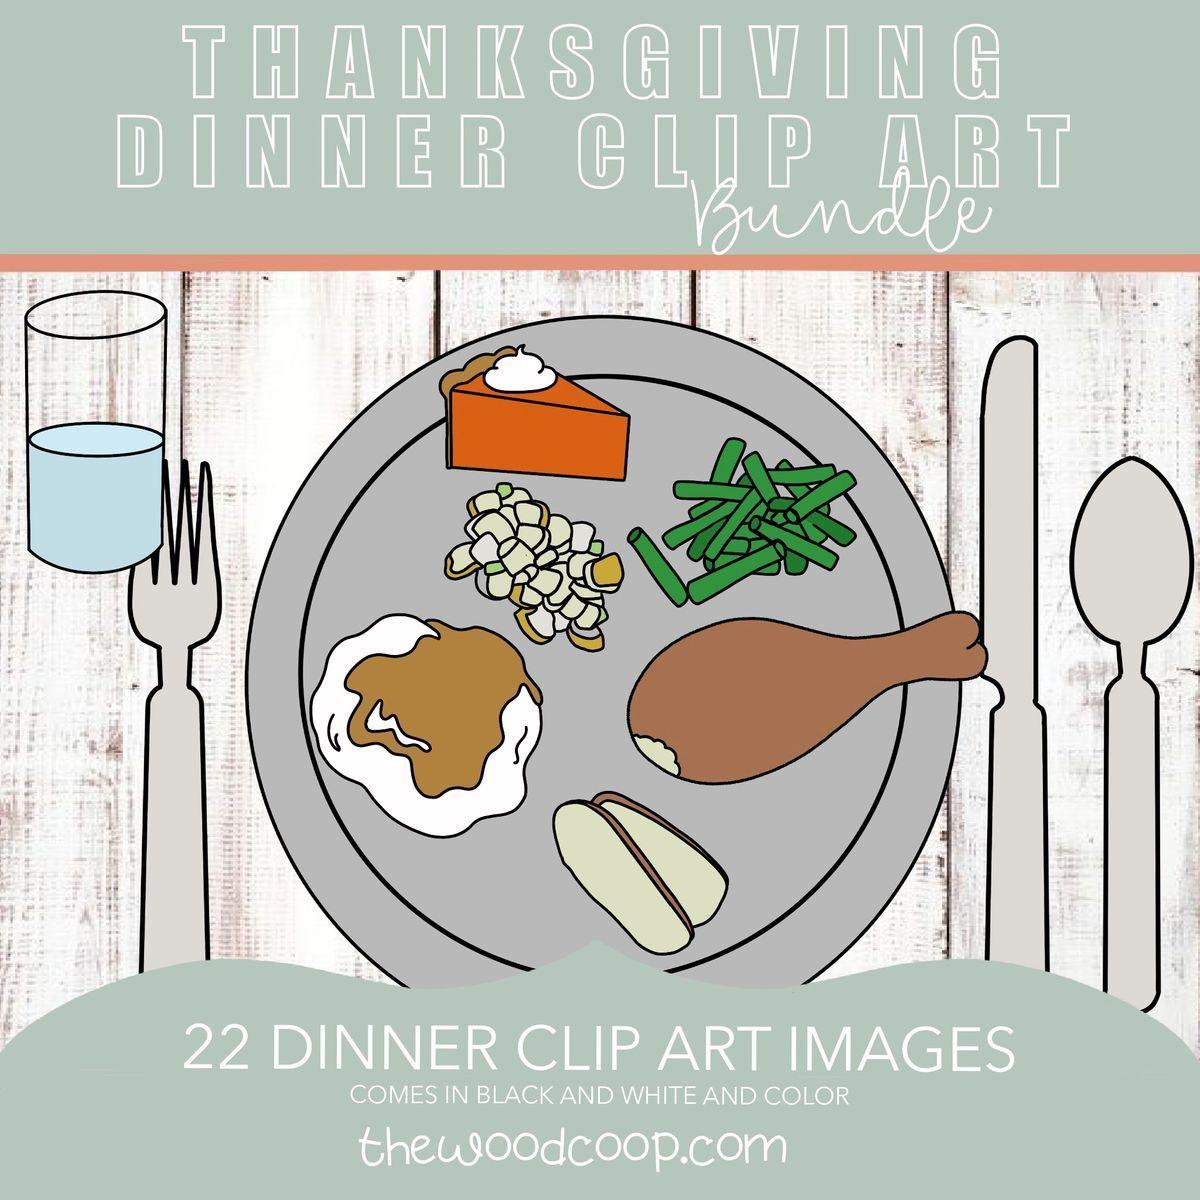 Thanksgiving dinner clip art 22 images (plate, fork, spoon